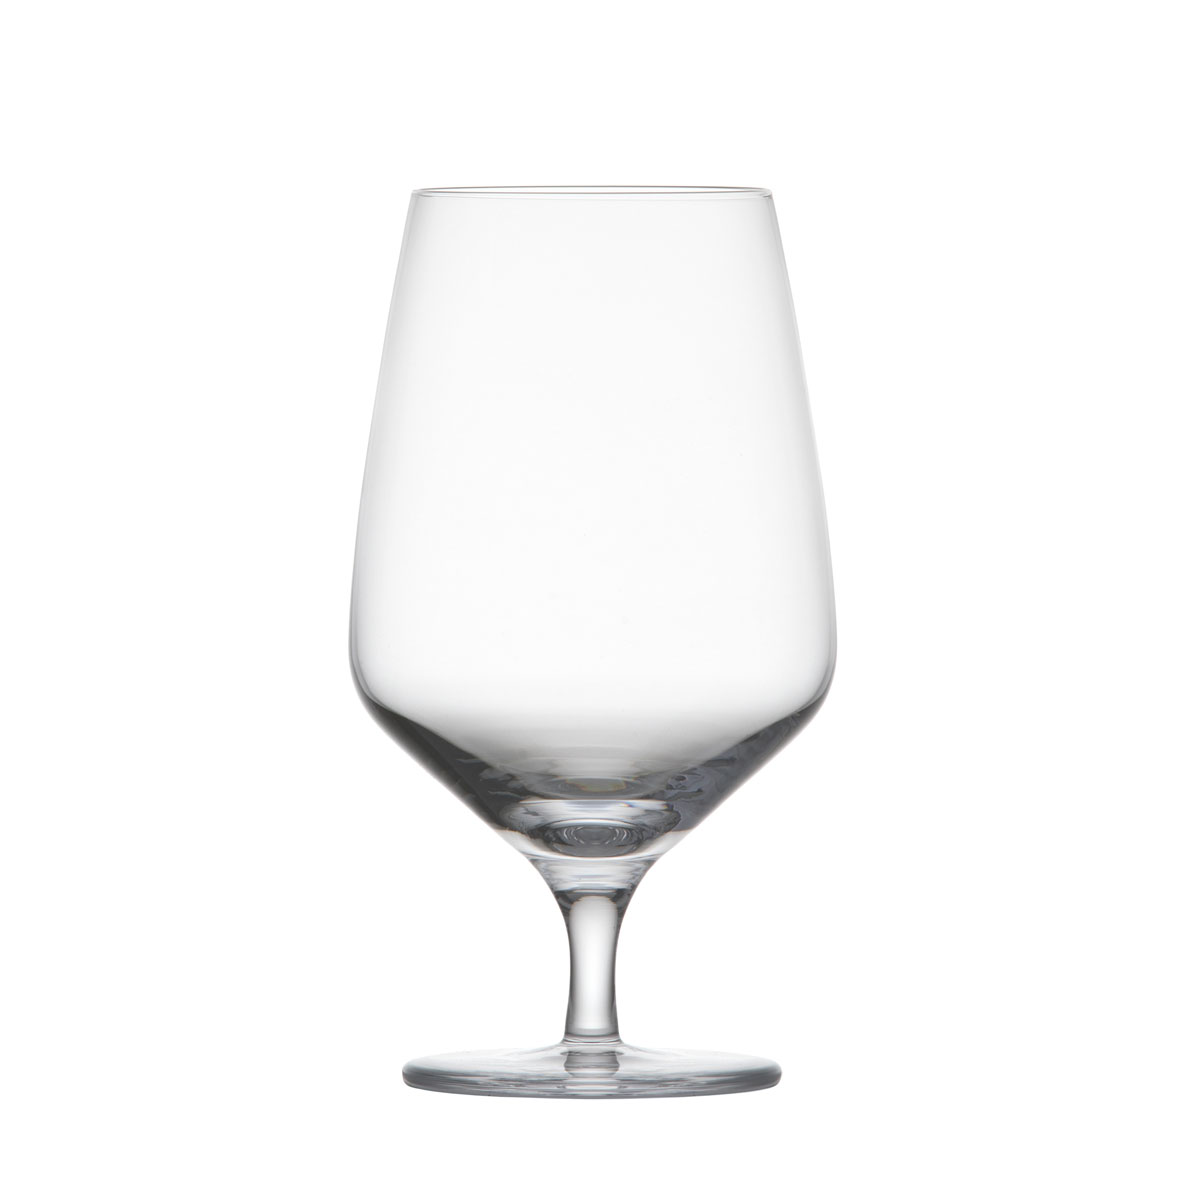 Schott Zwiesel Tritan Bistro Bordeaux, Cabernet Goblet, Single